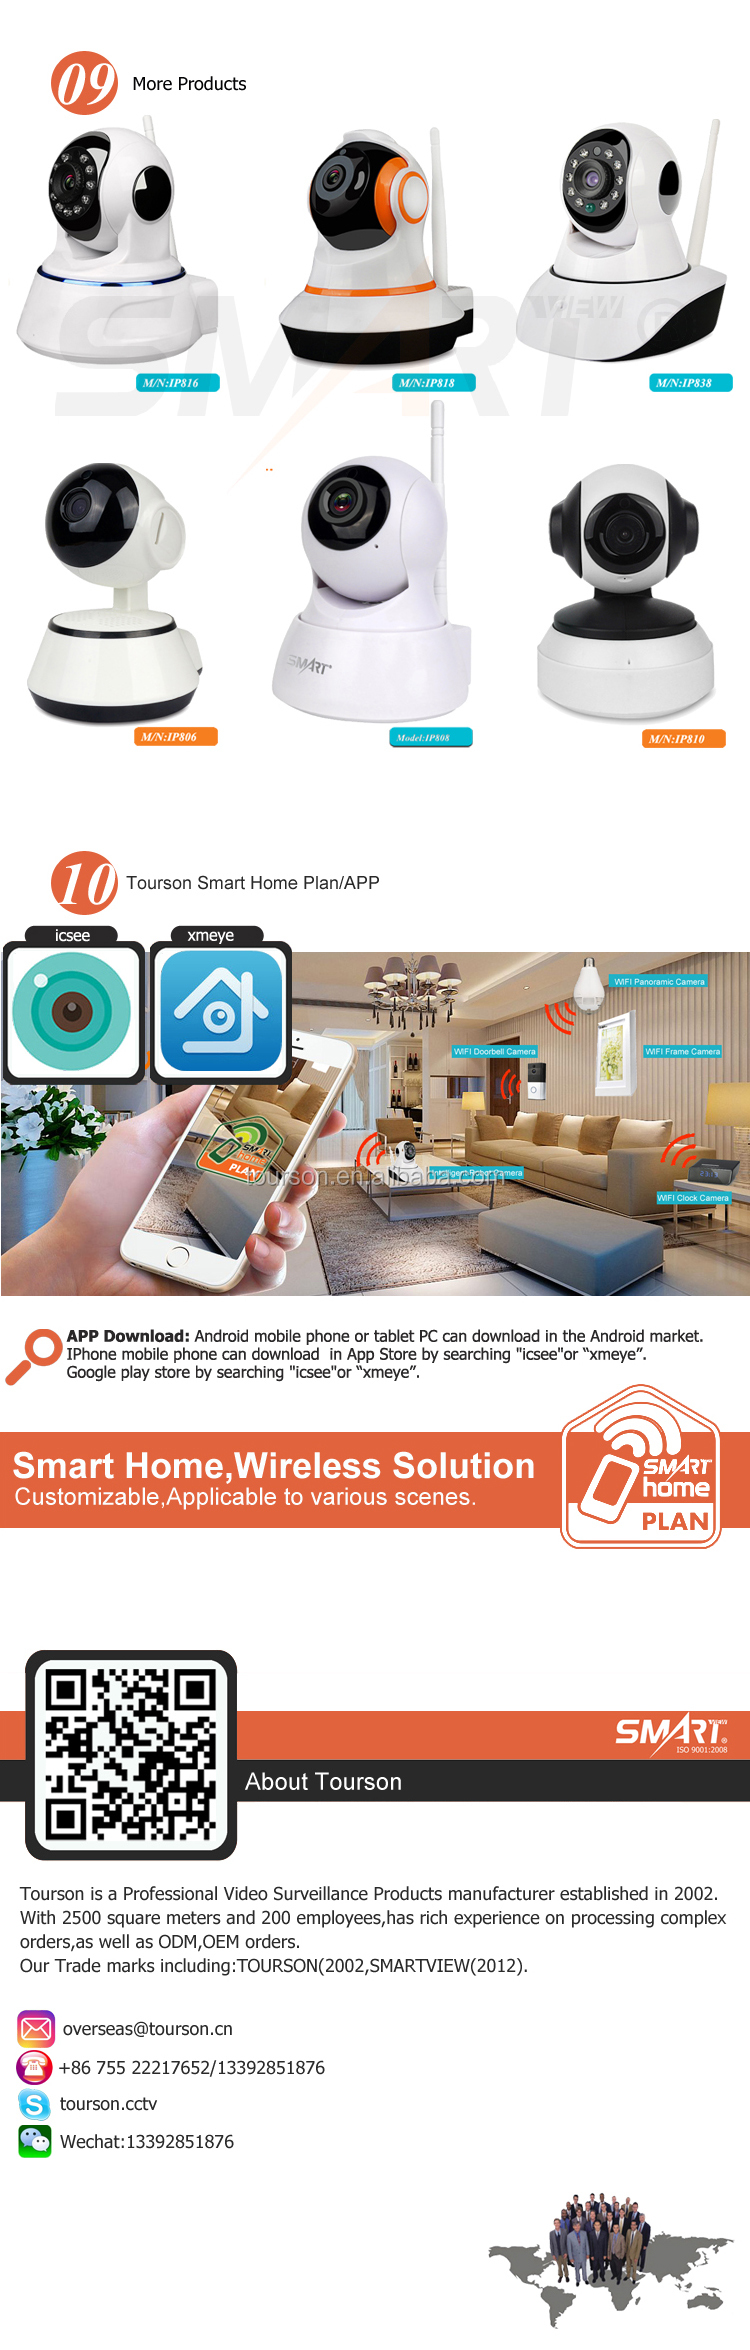 Hd 720p Pan Tilt Smart Home Wifi Wireless Ip Security Camera - Buy Ip  Security Camera,Security Camera,Wireless Security Camera Product on  Alibaba com